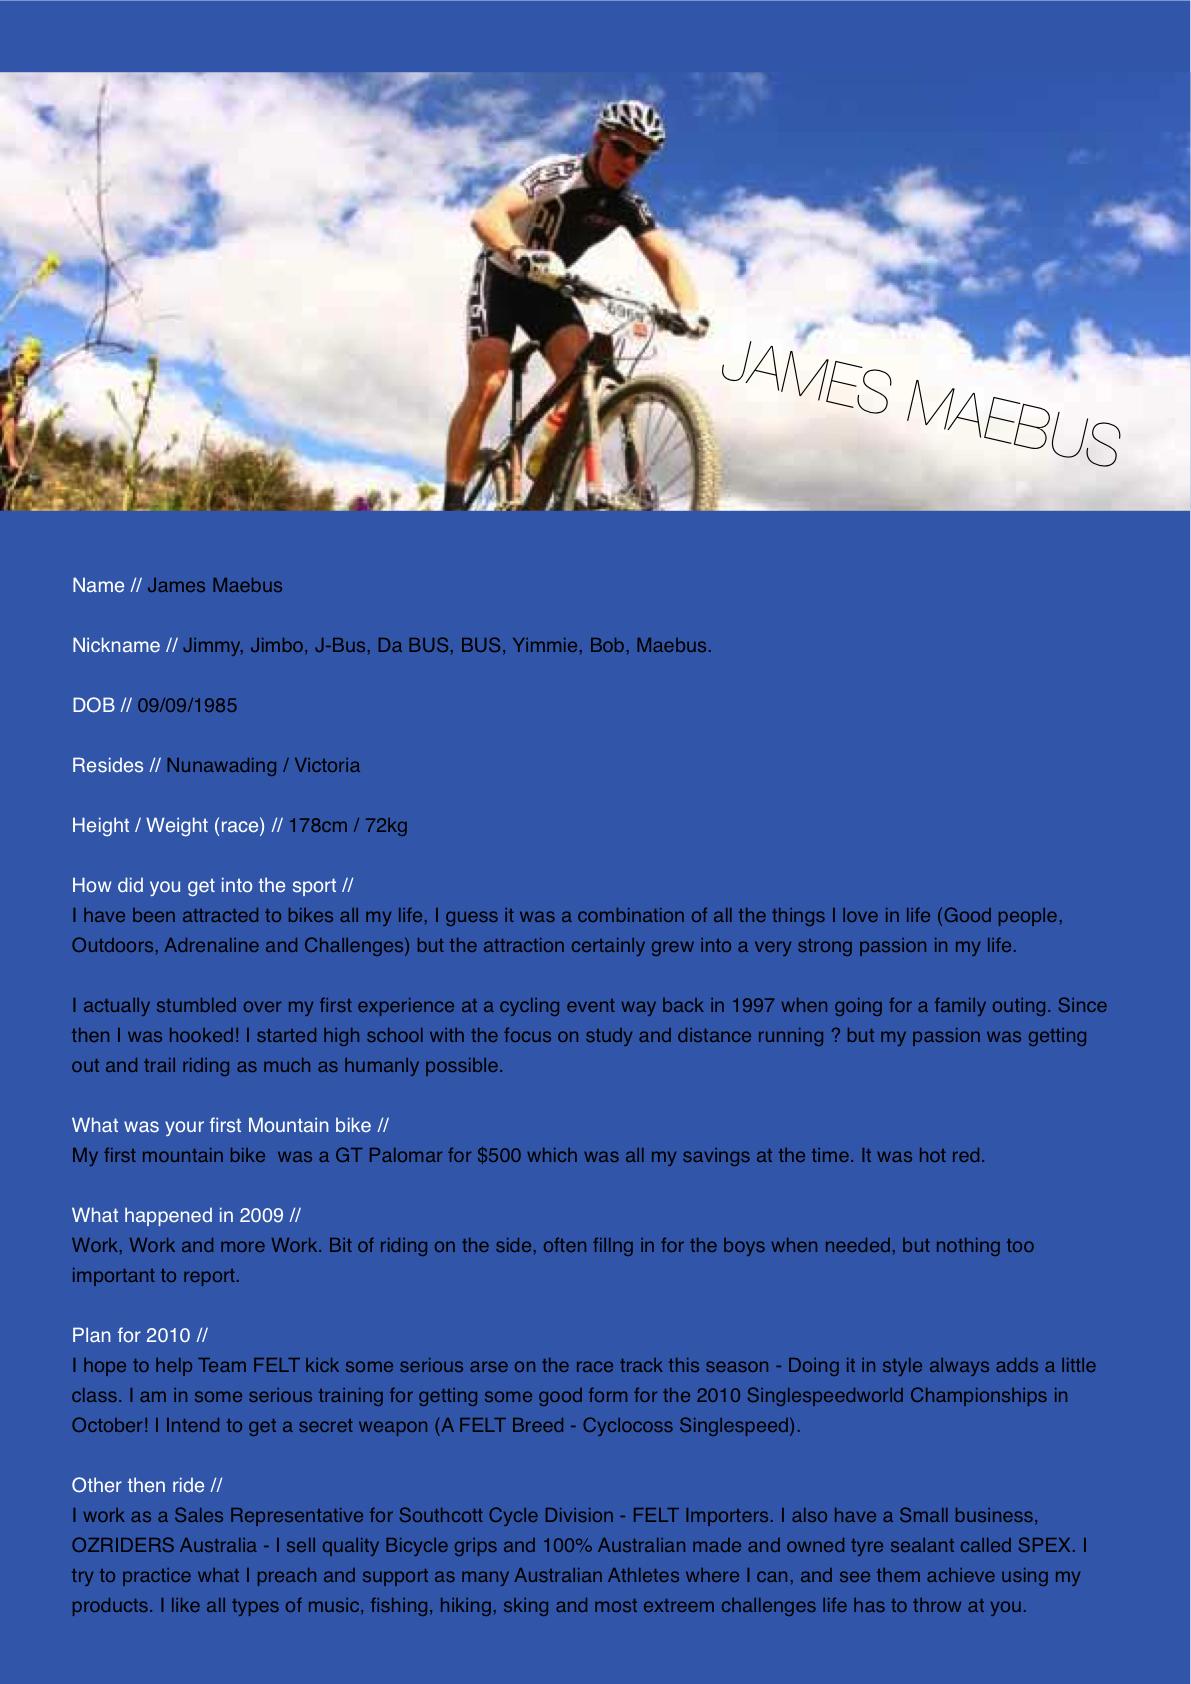 Riders | FELT SRAM Racing